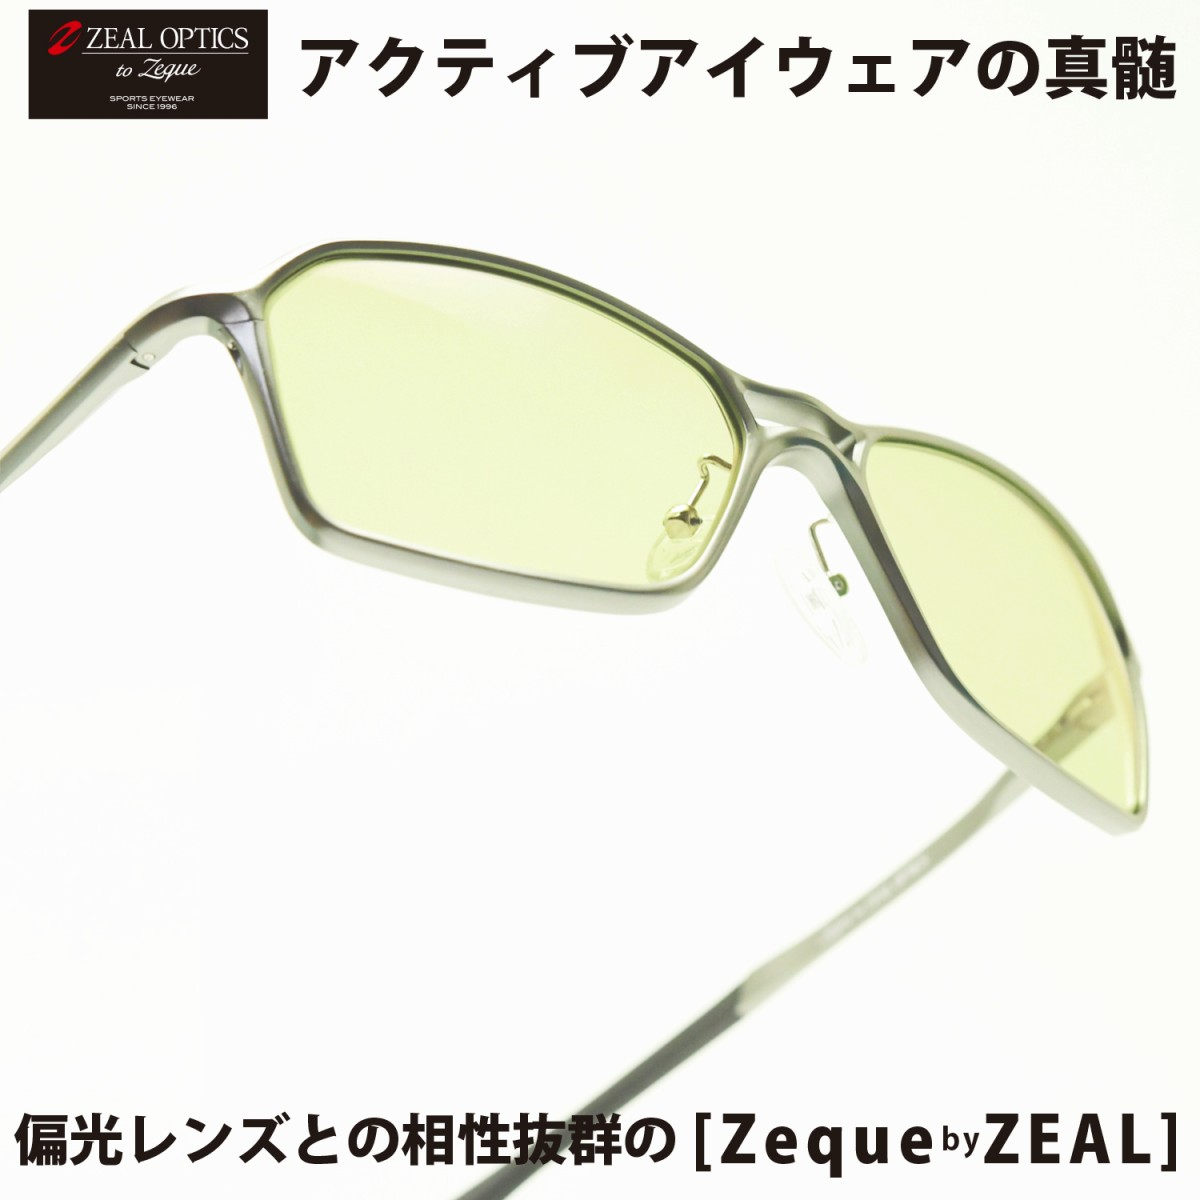 Zeque by ZEAL OPTICS ゼクーバイシールオプティックスVEGASAGE METAL/EASE GREEN